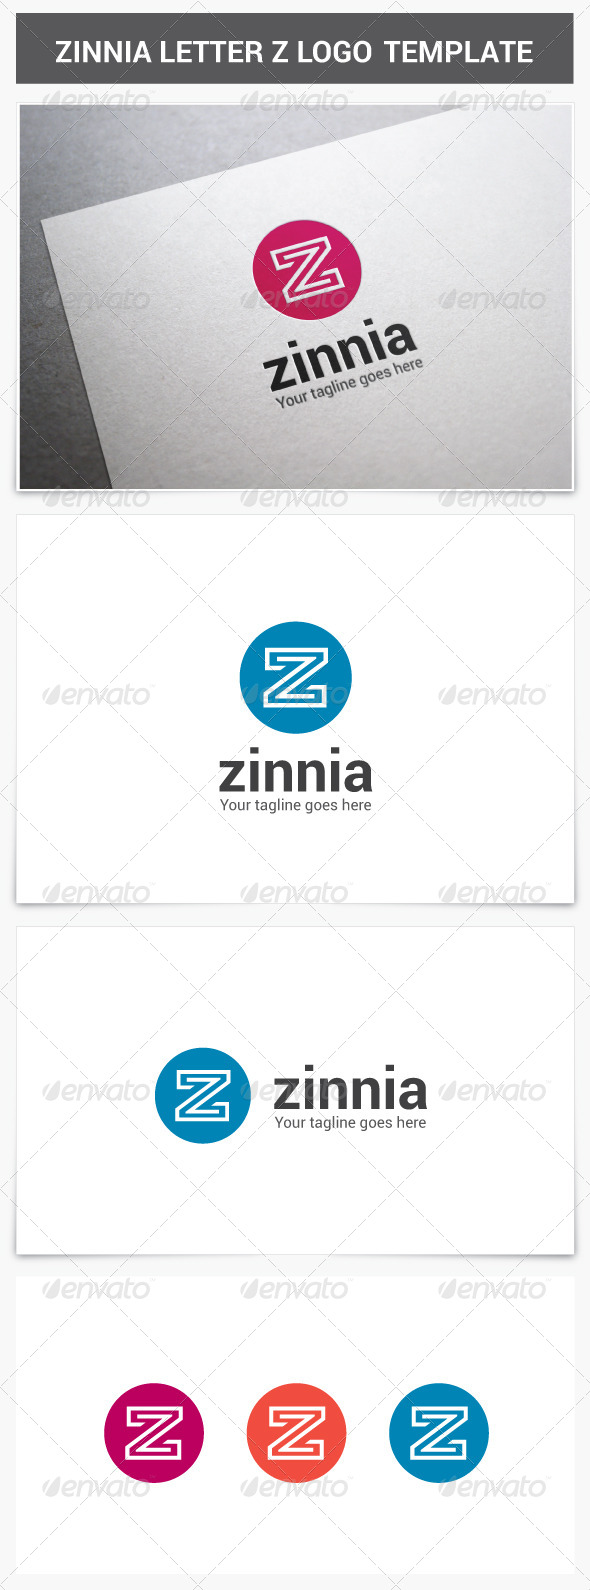 GraphicRiver Zinnia Letter Z Logo 7721187